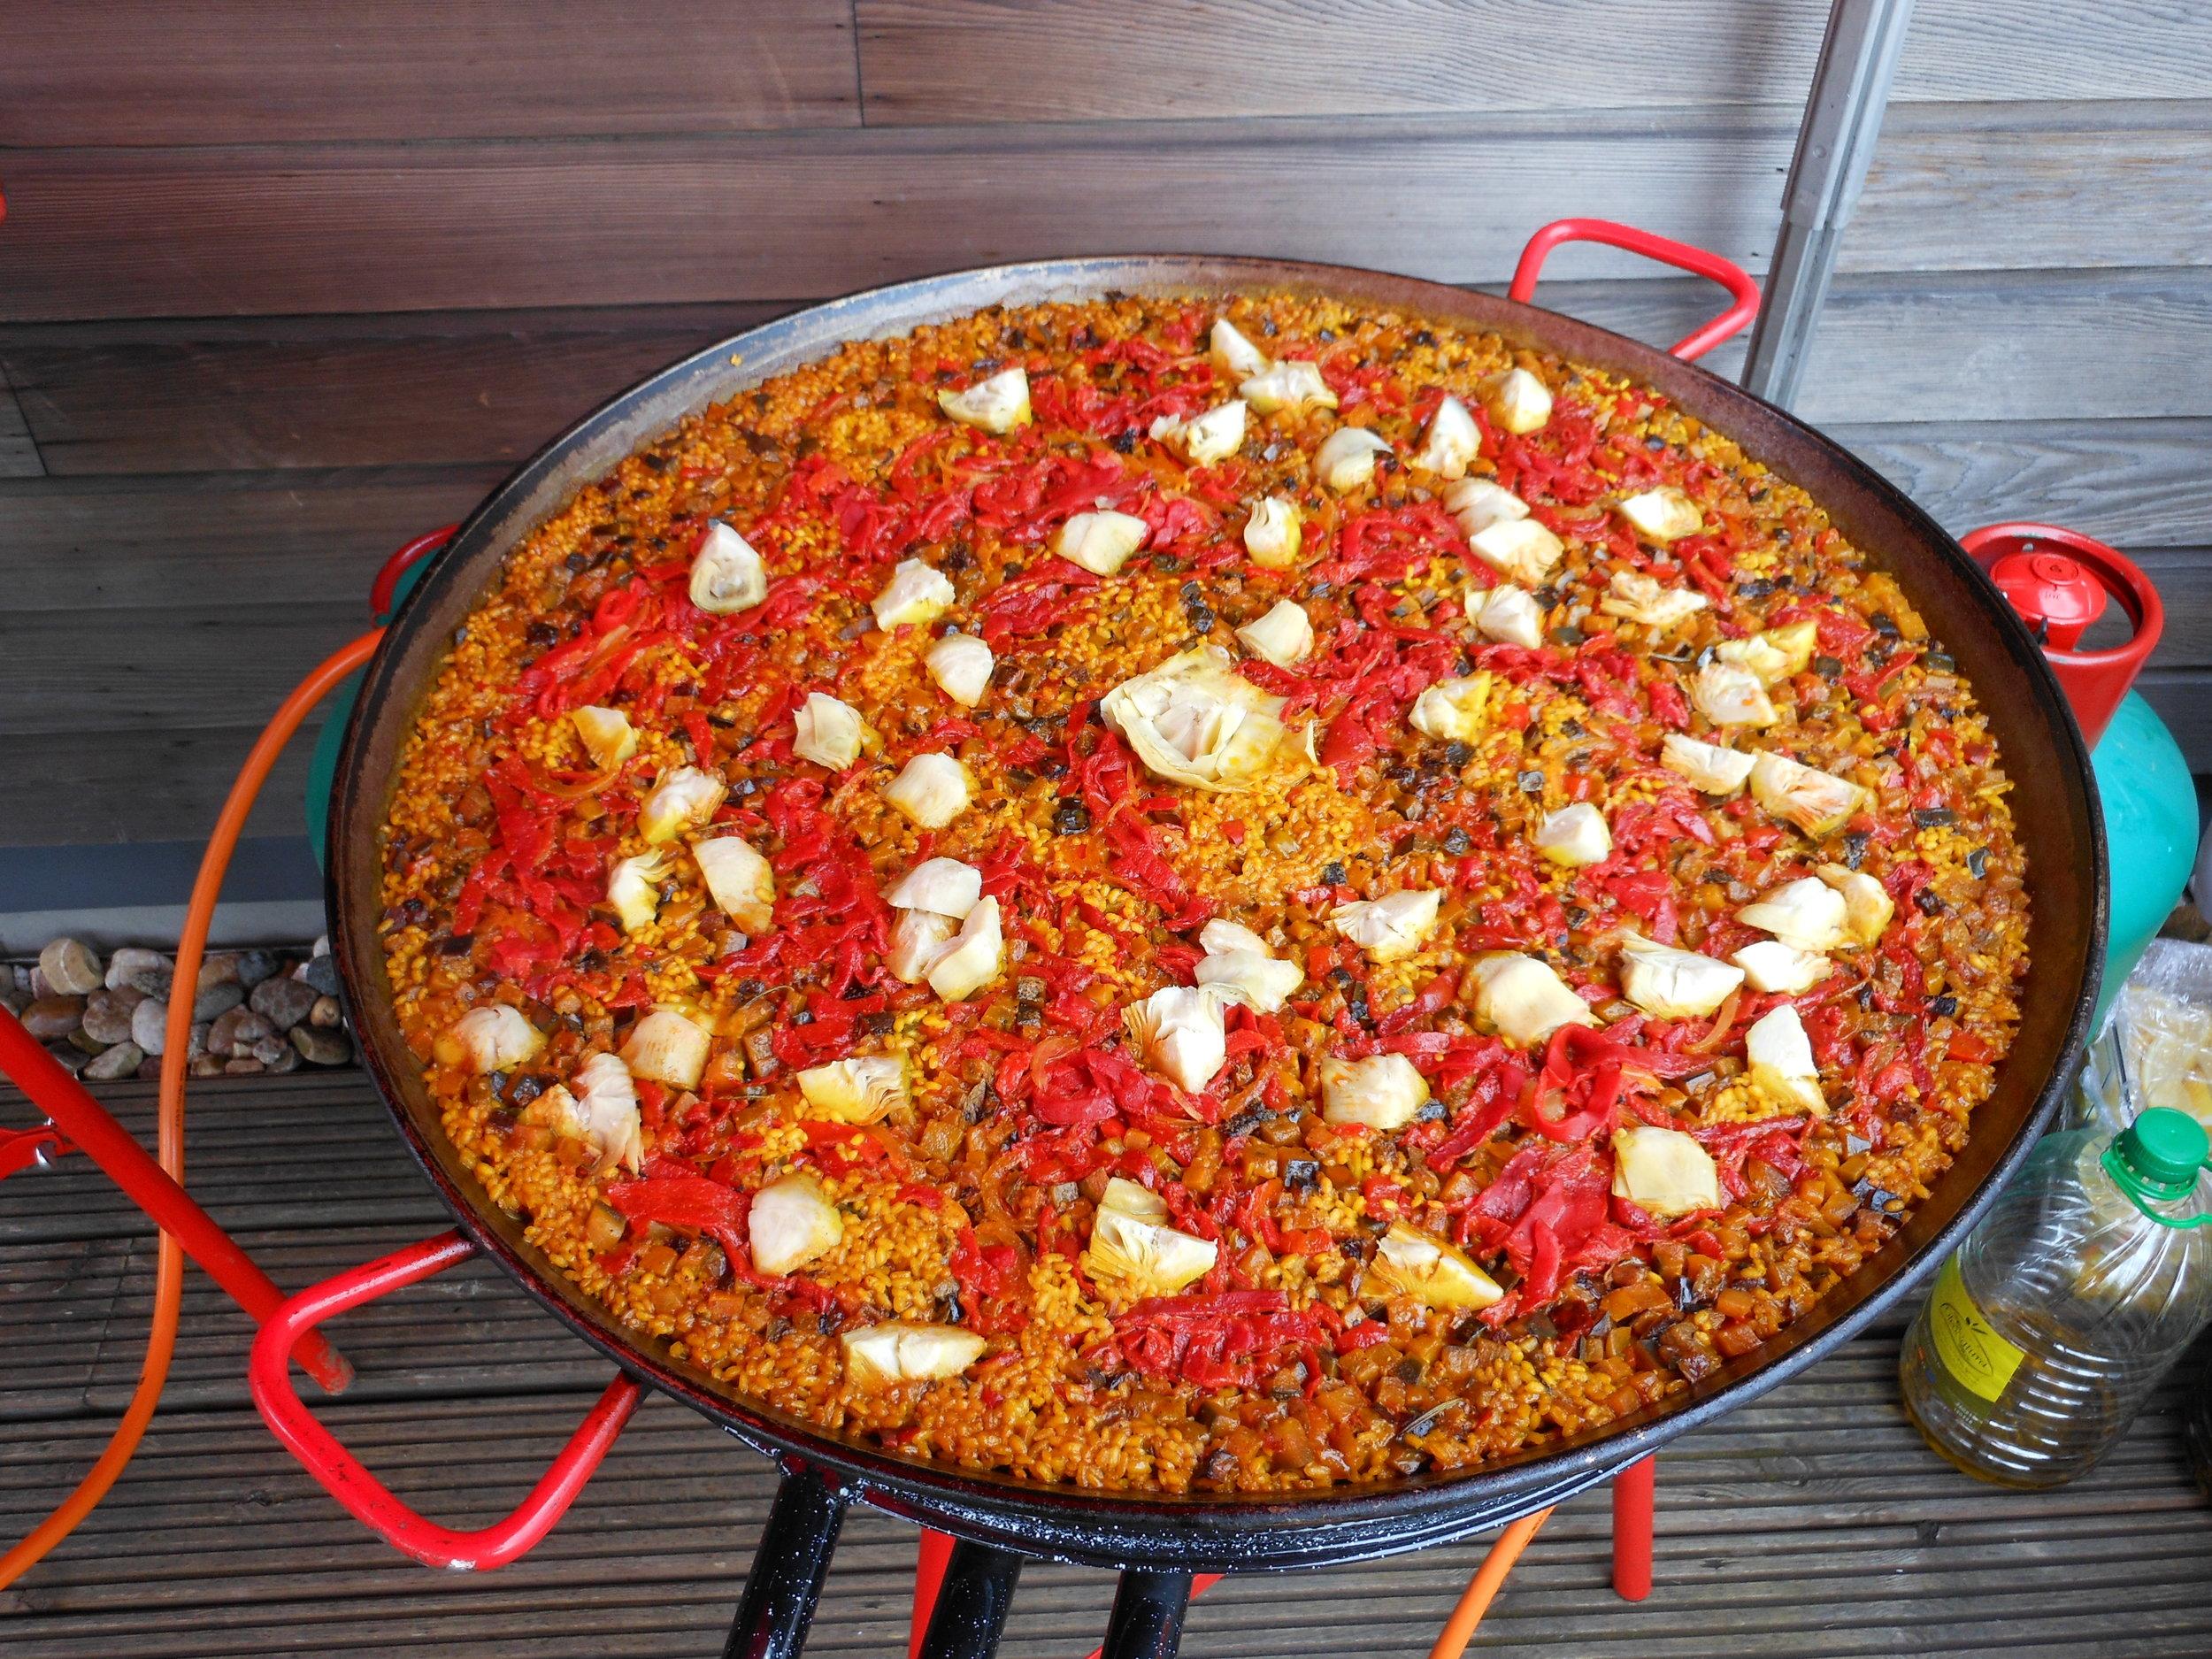 Freshly mad vegetarian Paella with artichokes